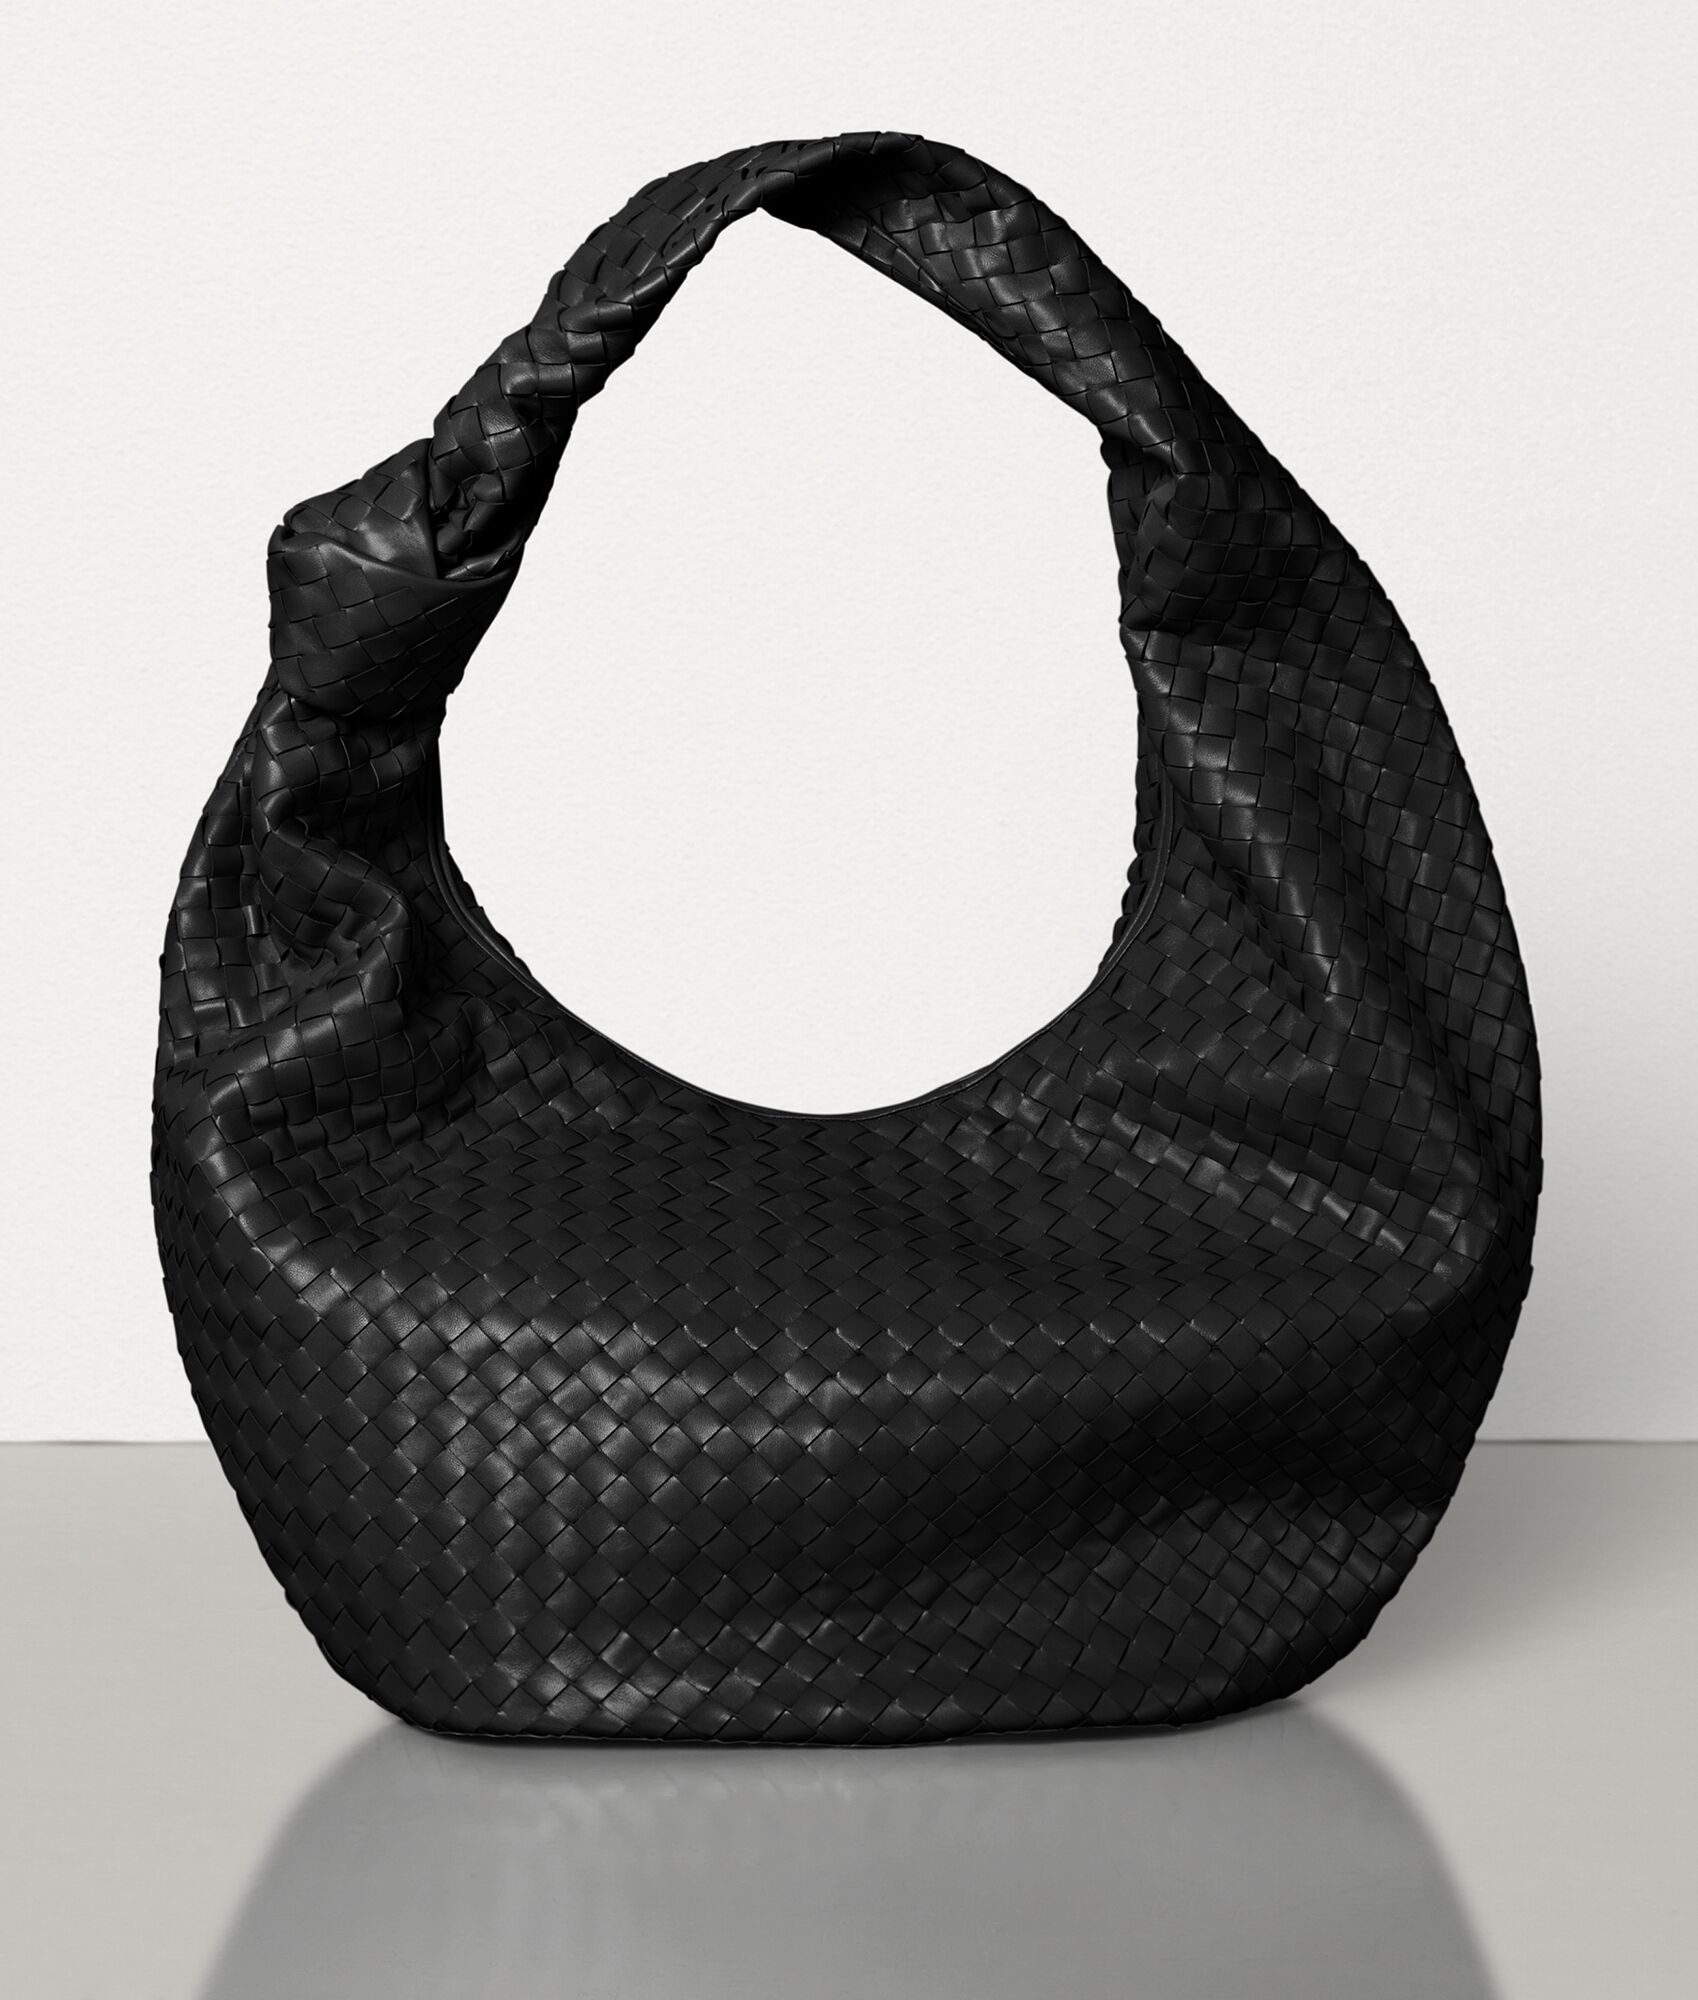 JODIE by Bottega Veneta, available on bottegaveneta.com for $6250 Kendall Jenner Bags Exact Product